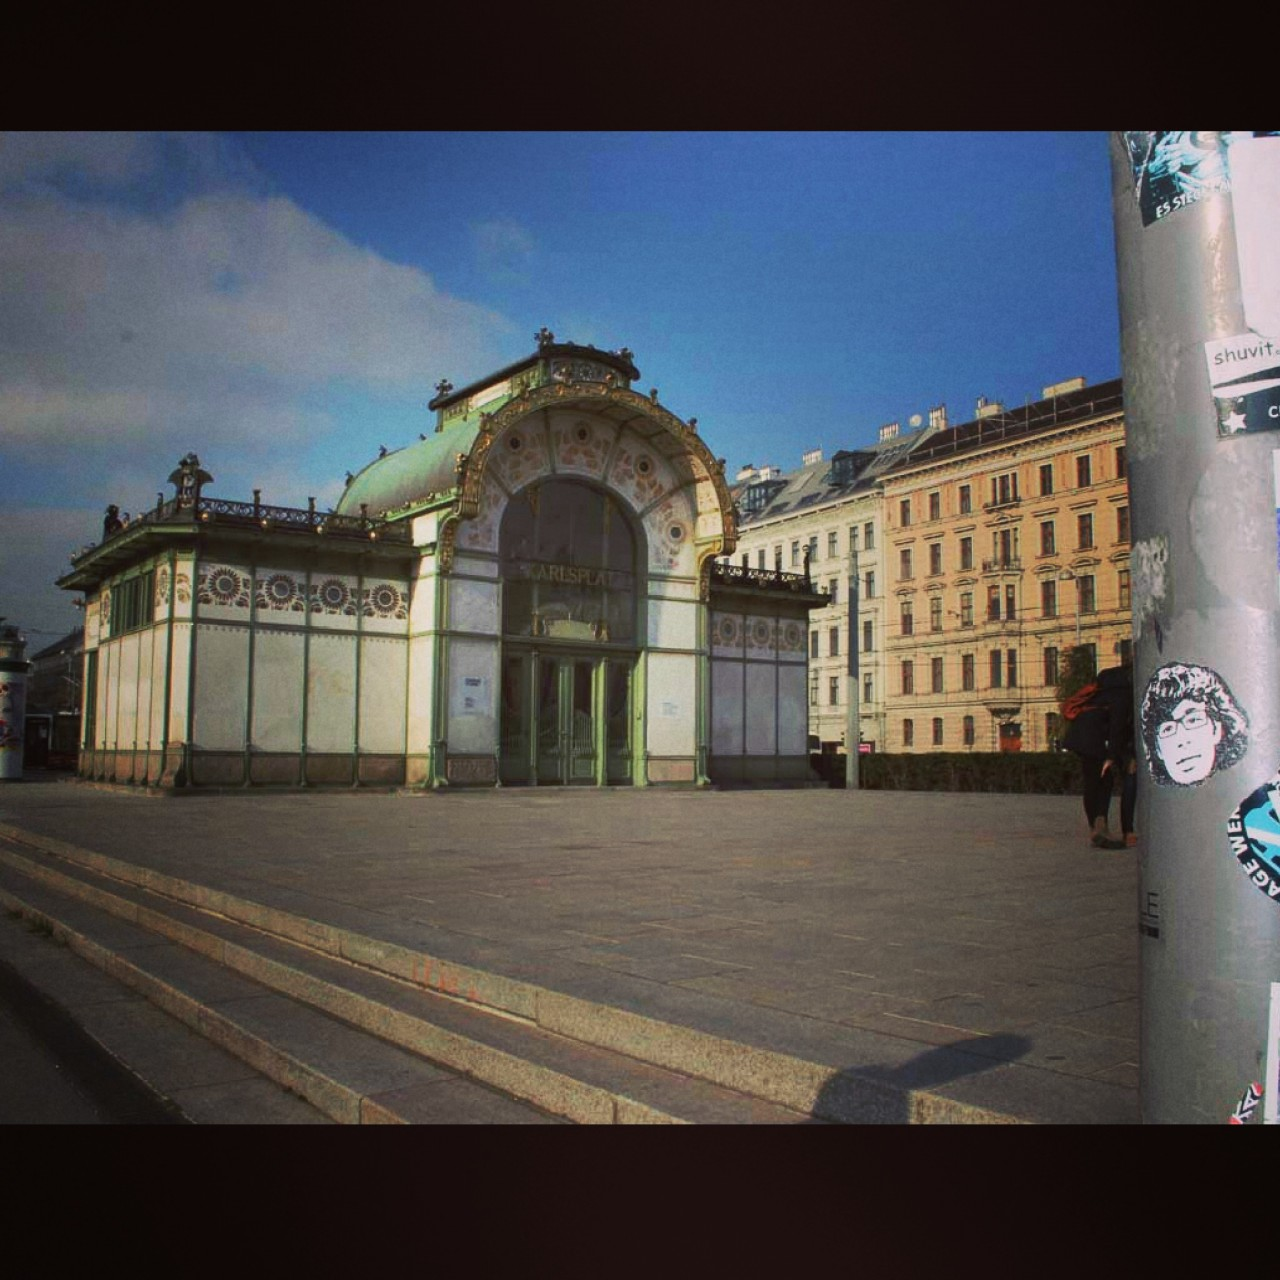 Peipegata sticker slap stickerart  bombardeando Viena-Austria